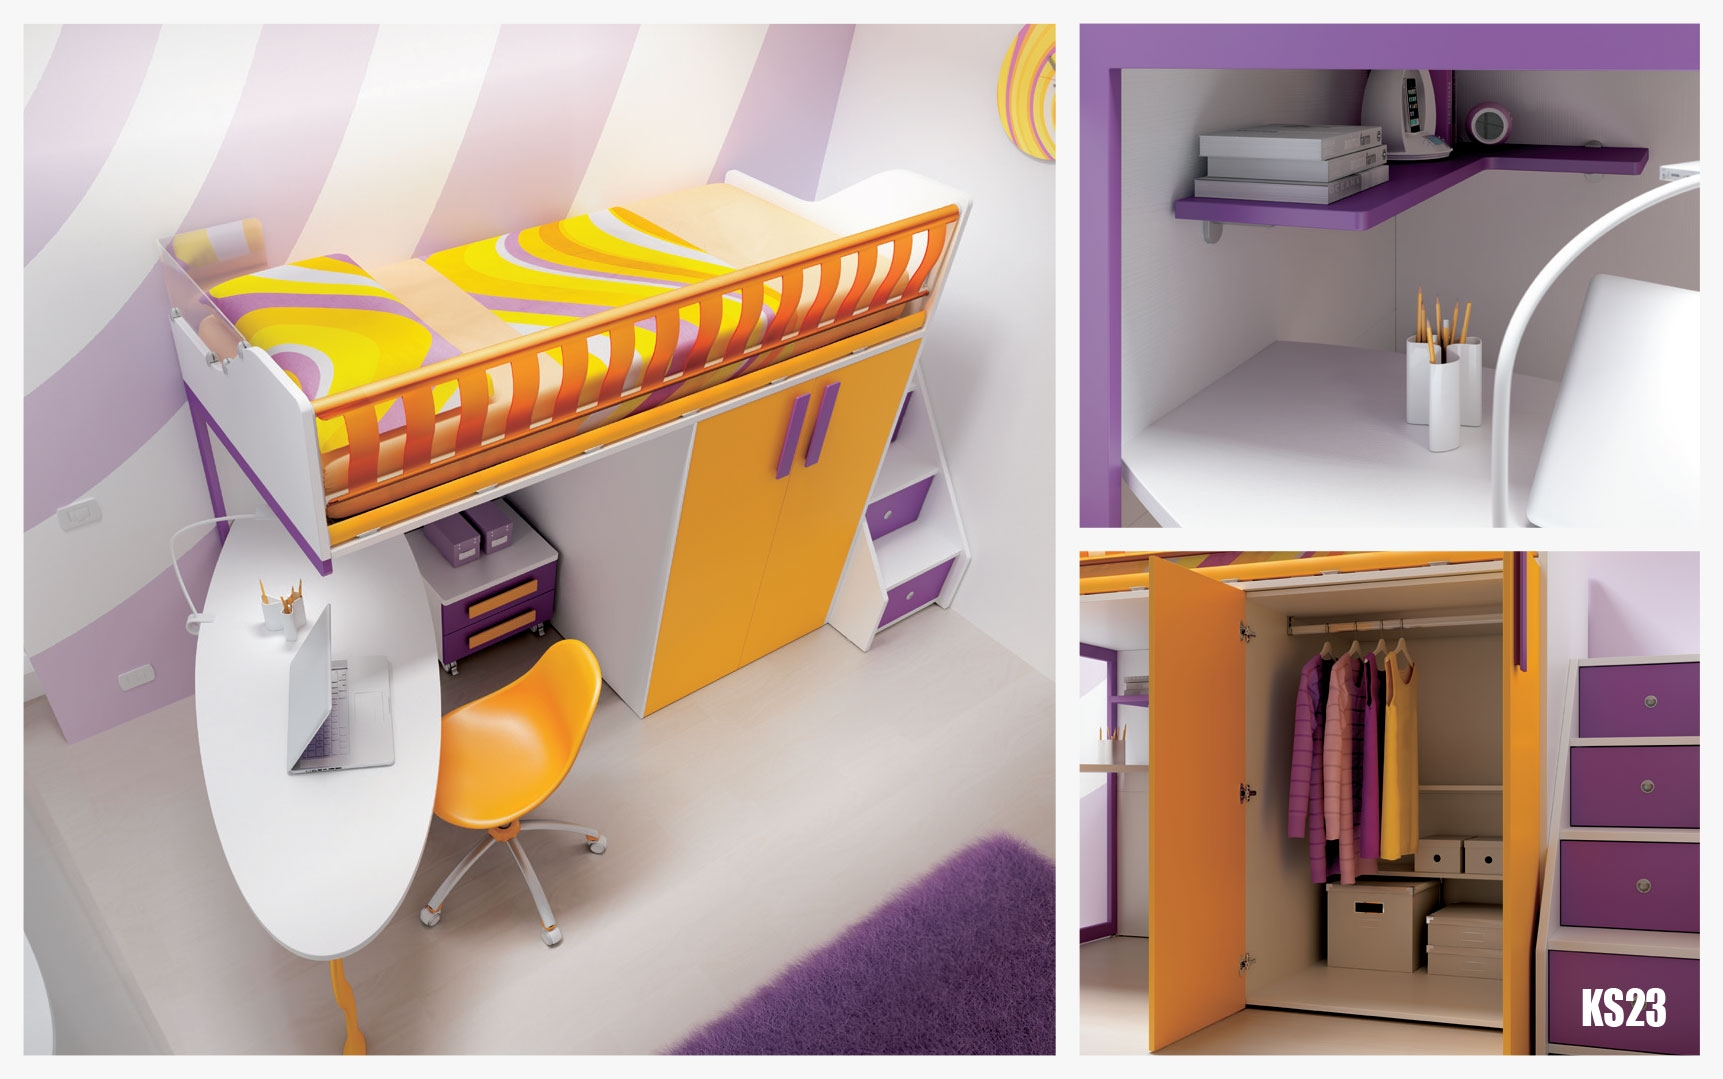 ... Chambre Enfant PERSONNALISABLE KS23 Lit Mezzanine Ultra Compact    MORETTI COMPACT ...